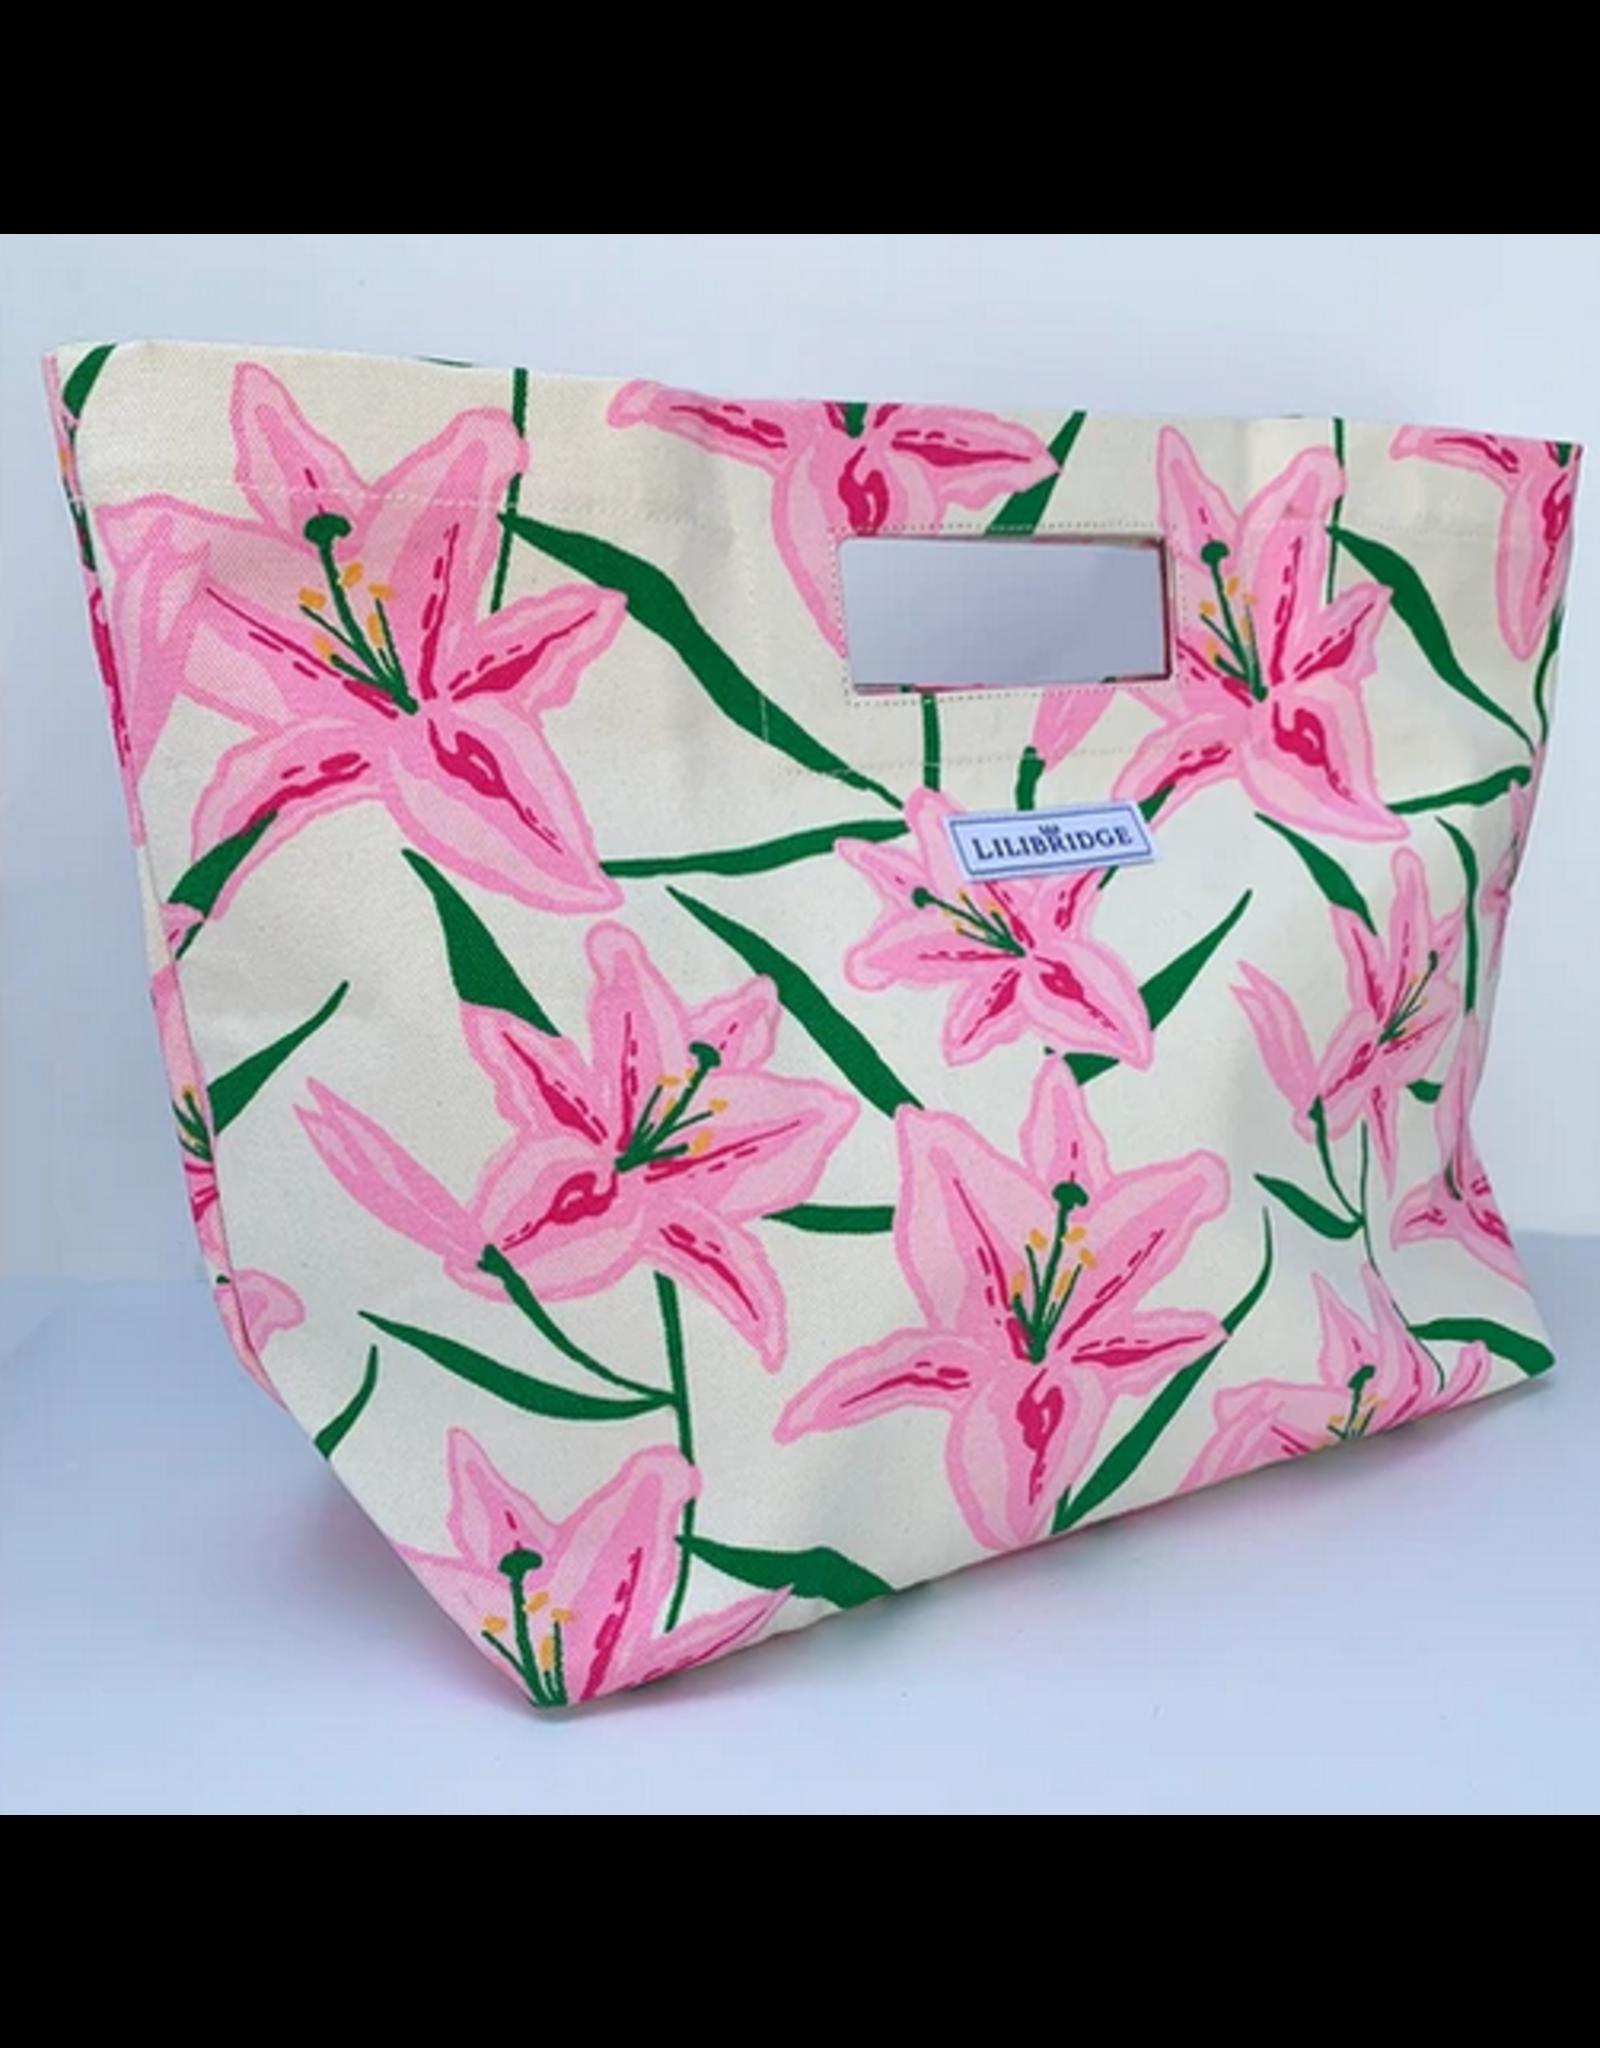 Lilibridge Pink Lili Bag by Lilibridge